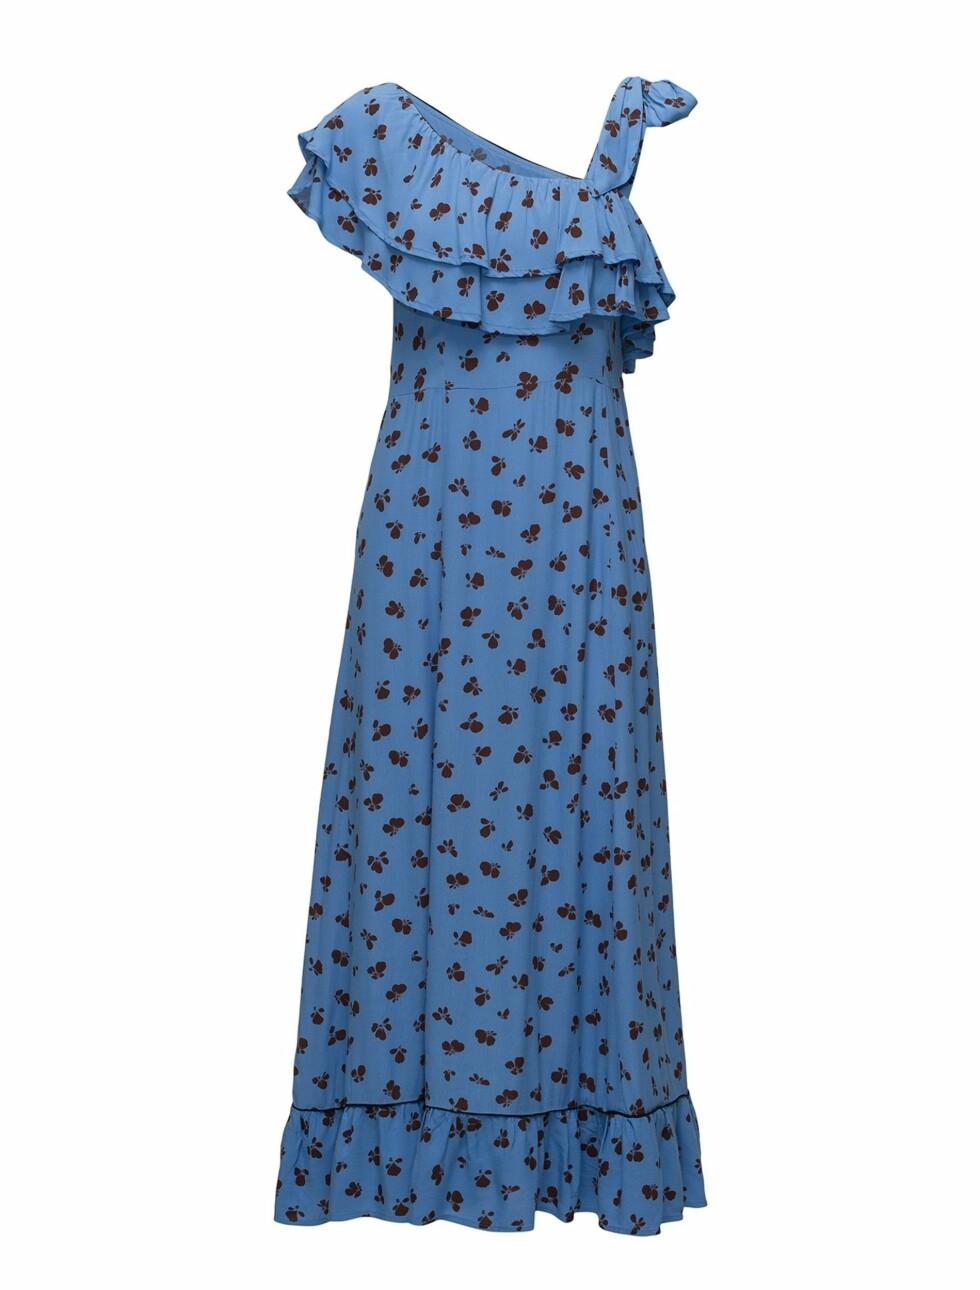 Kjole fra Ganni  1160,-  https://www.boozt.com/no/no/ganni/roseburg-crepe_17246010/17246011?navId=67453&group=listing&position=1000000